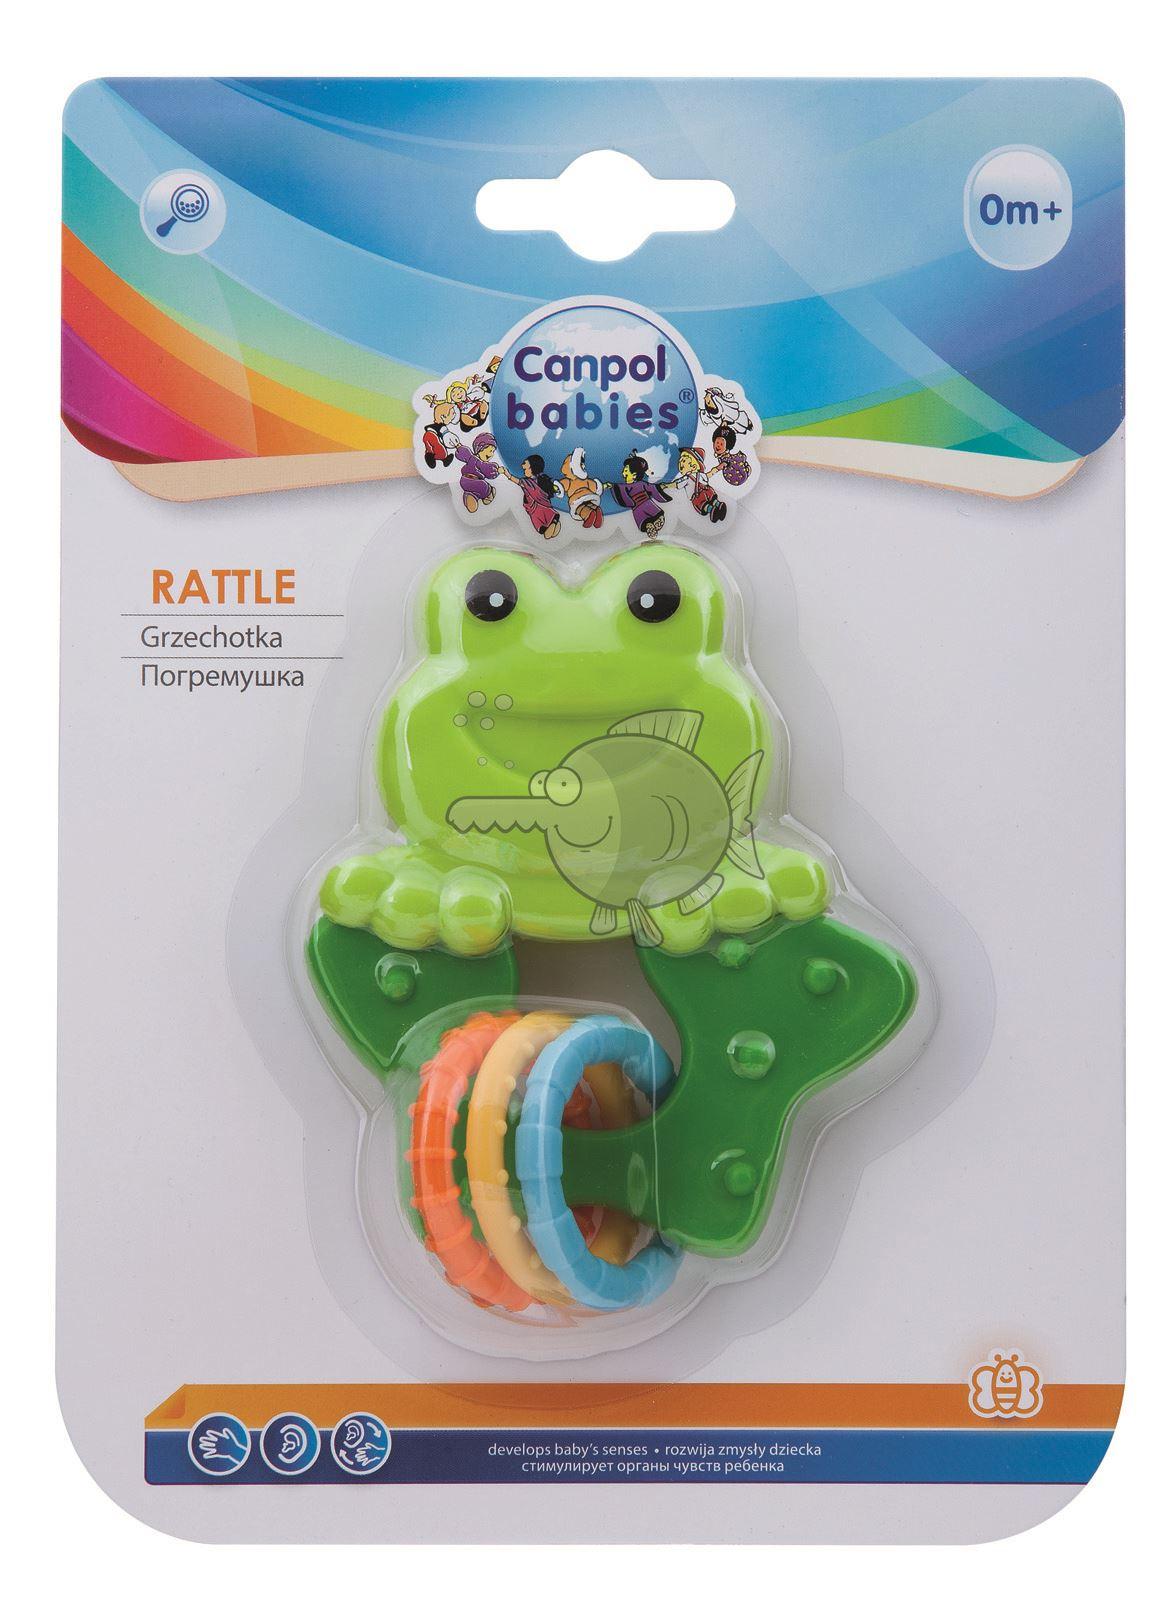 Baby Cartoon Elephant Plastic Shaking Rattles Bell Educational Toy Gift UK Stock